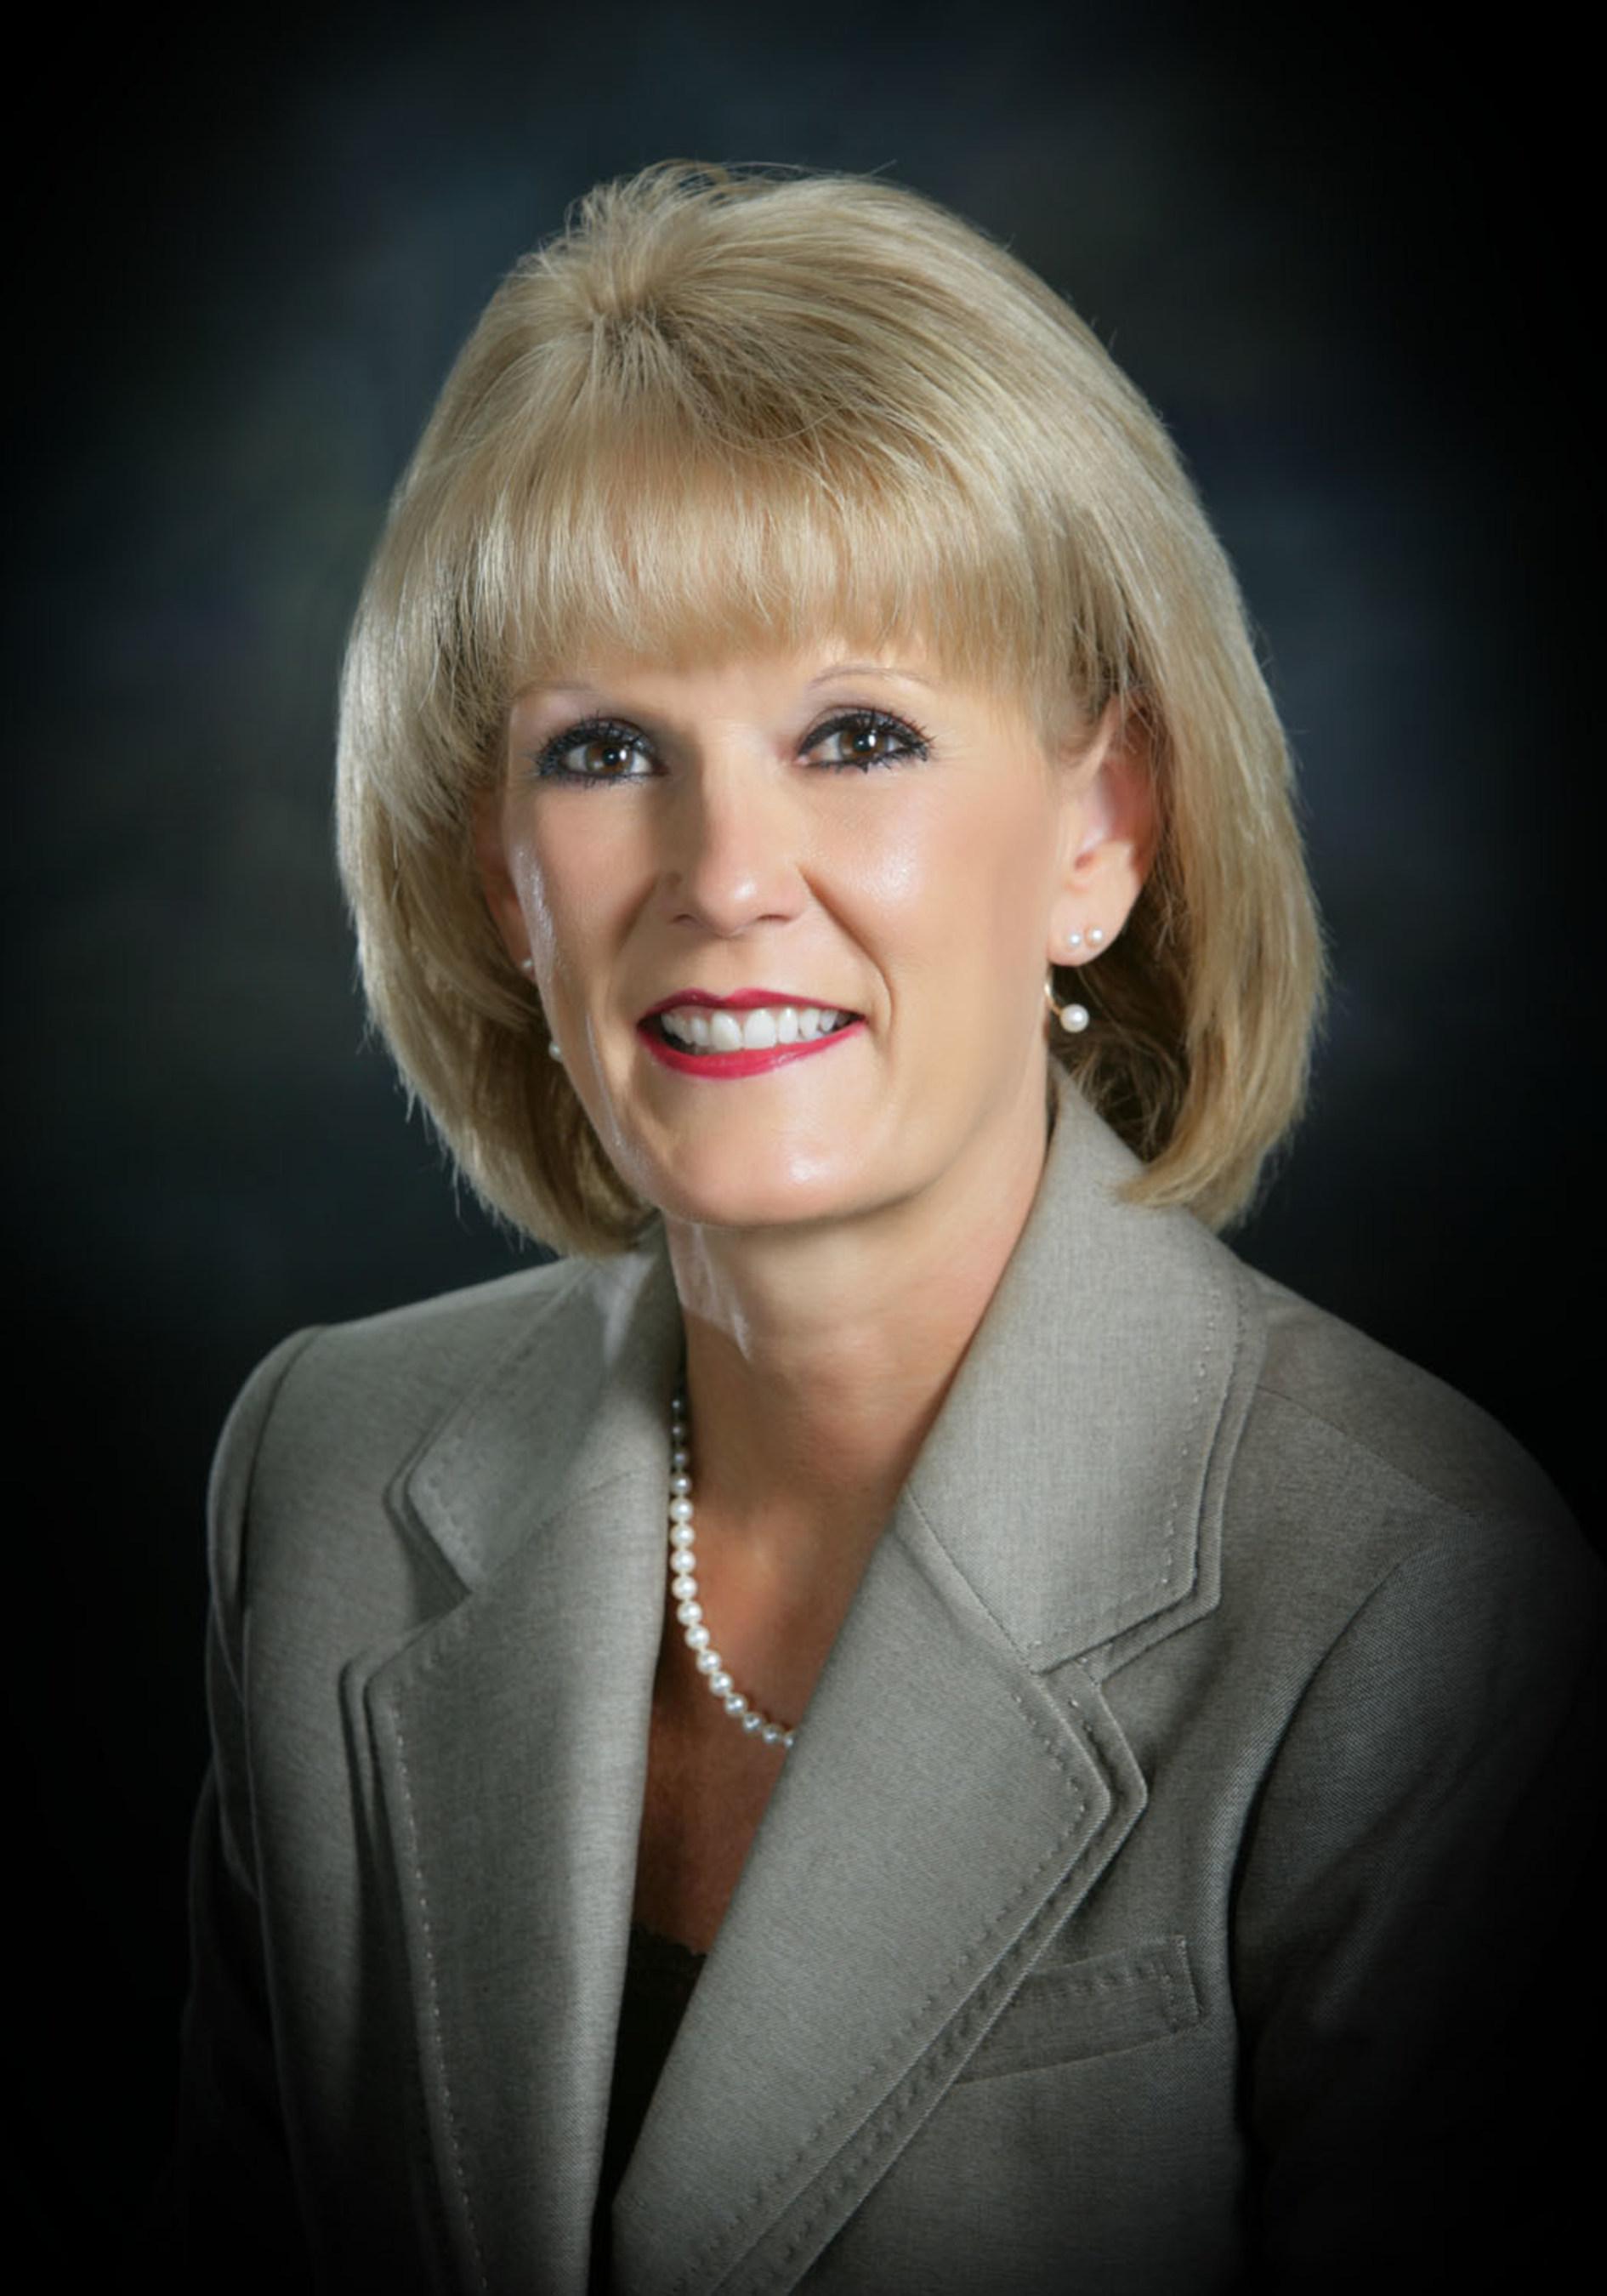 Kathy J. Bobbs